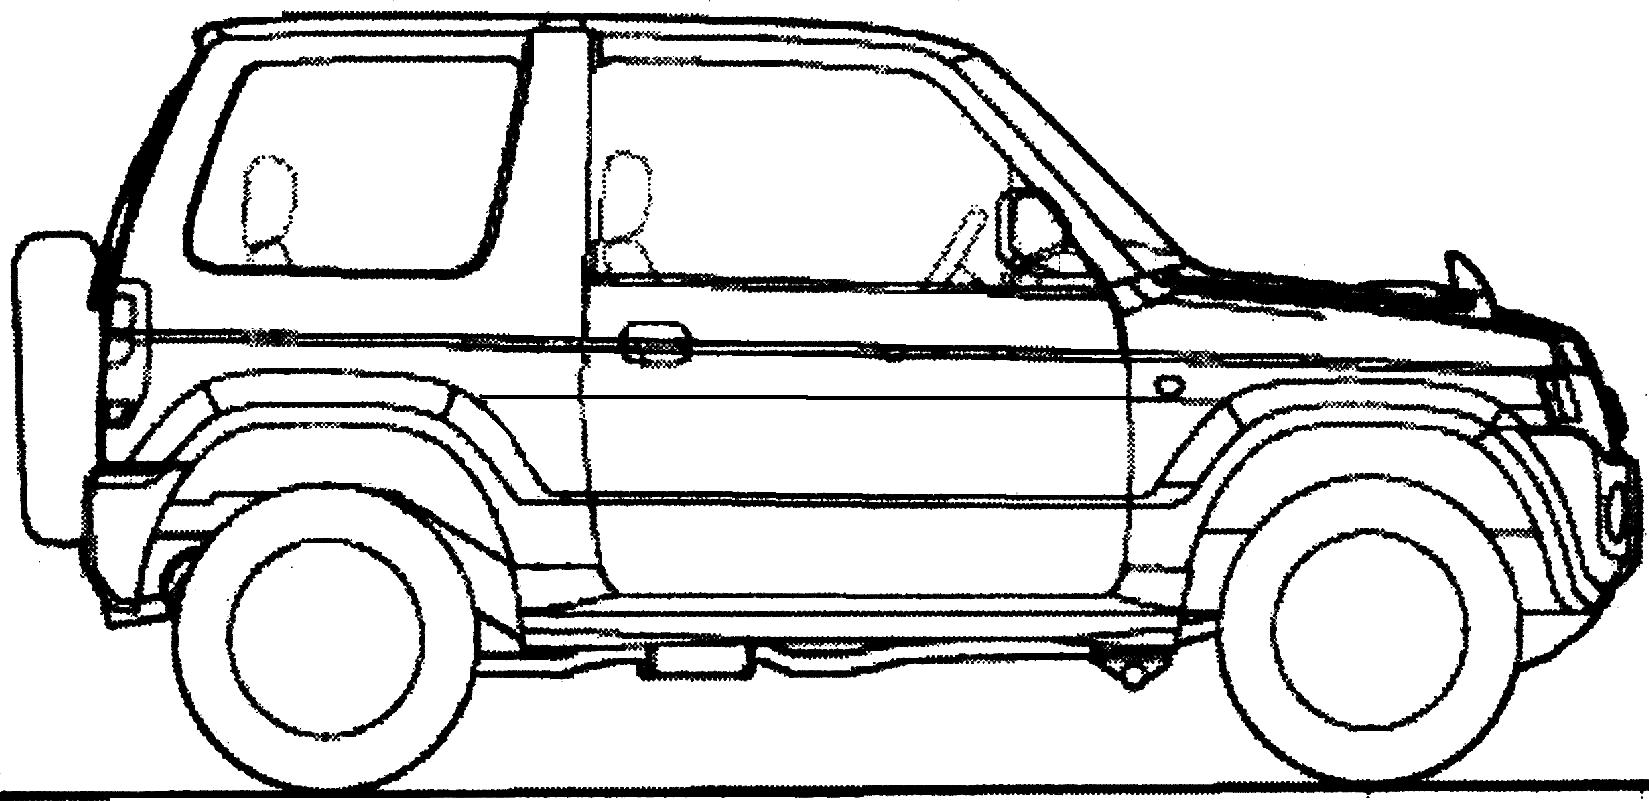 Nissan Kix Suv Blueprints Free